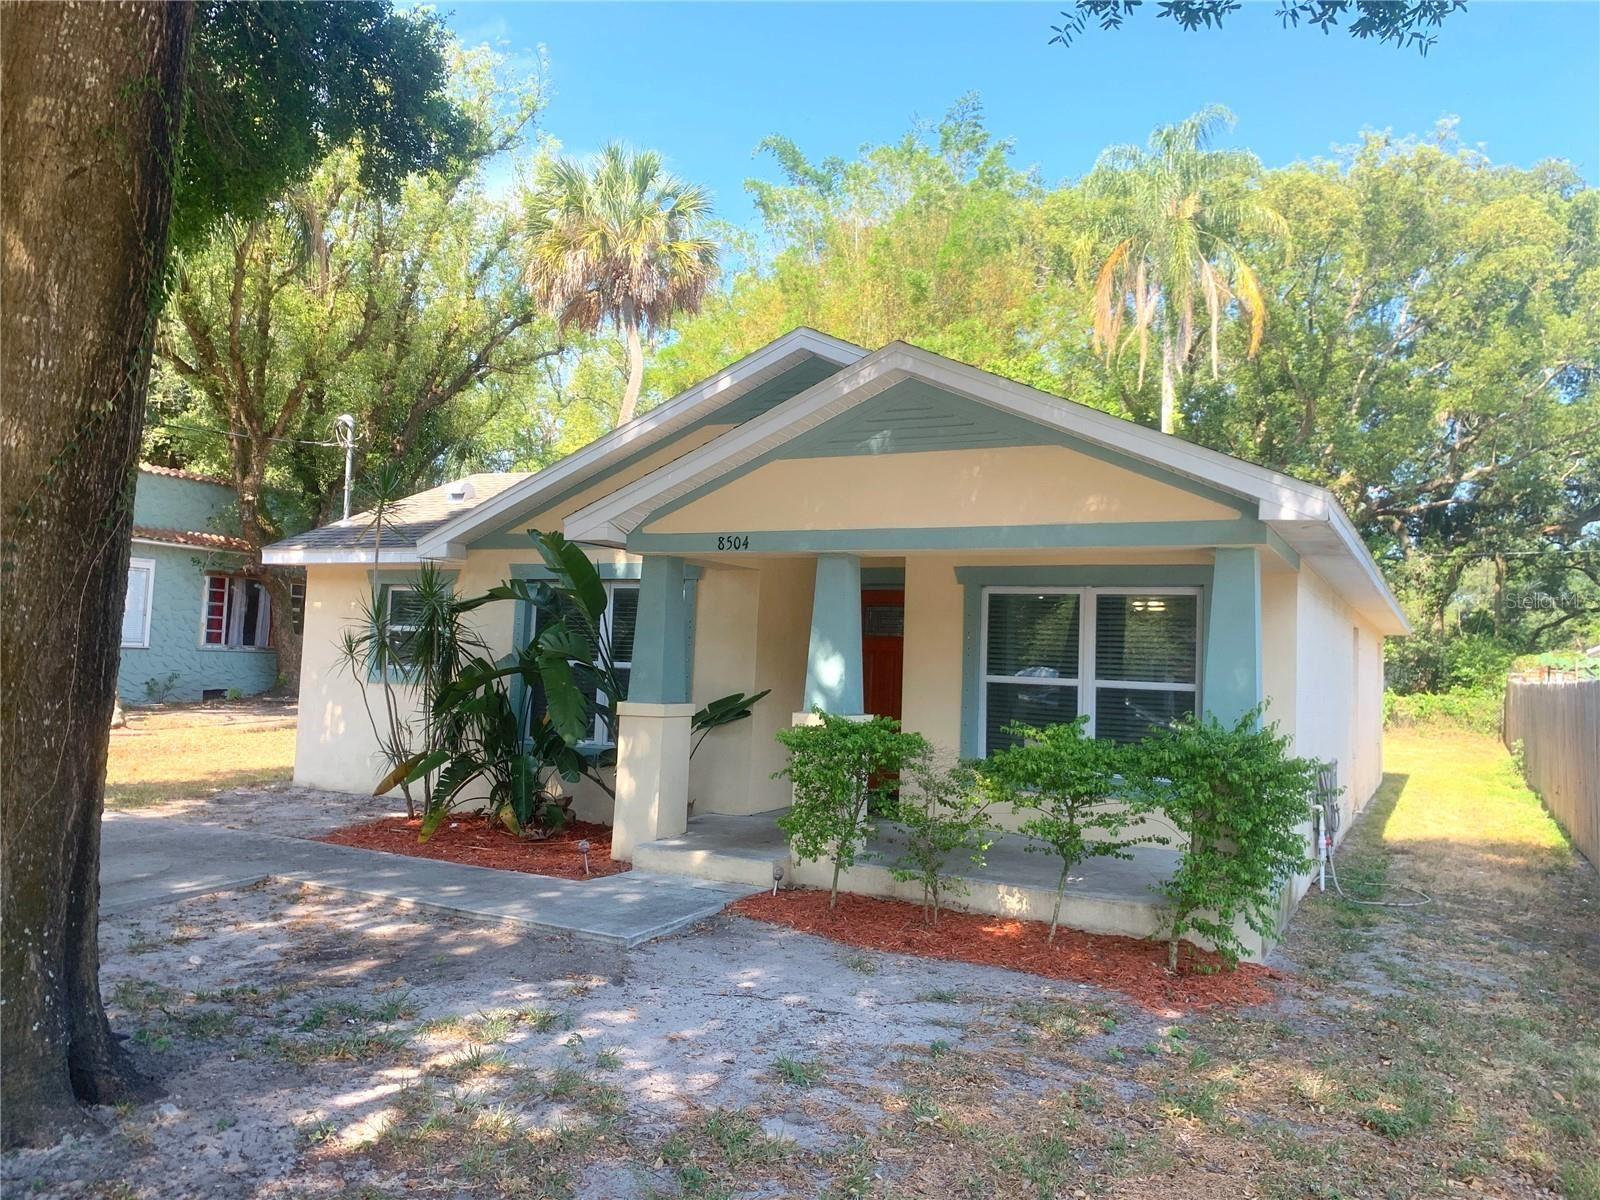 8504 N EDISON AVENUE, Tampa, FL 33604 - MLS#: U8121809